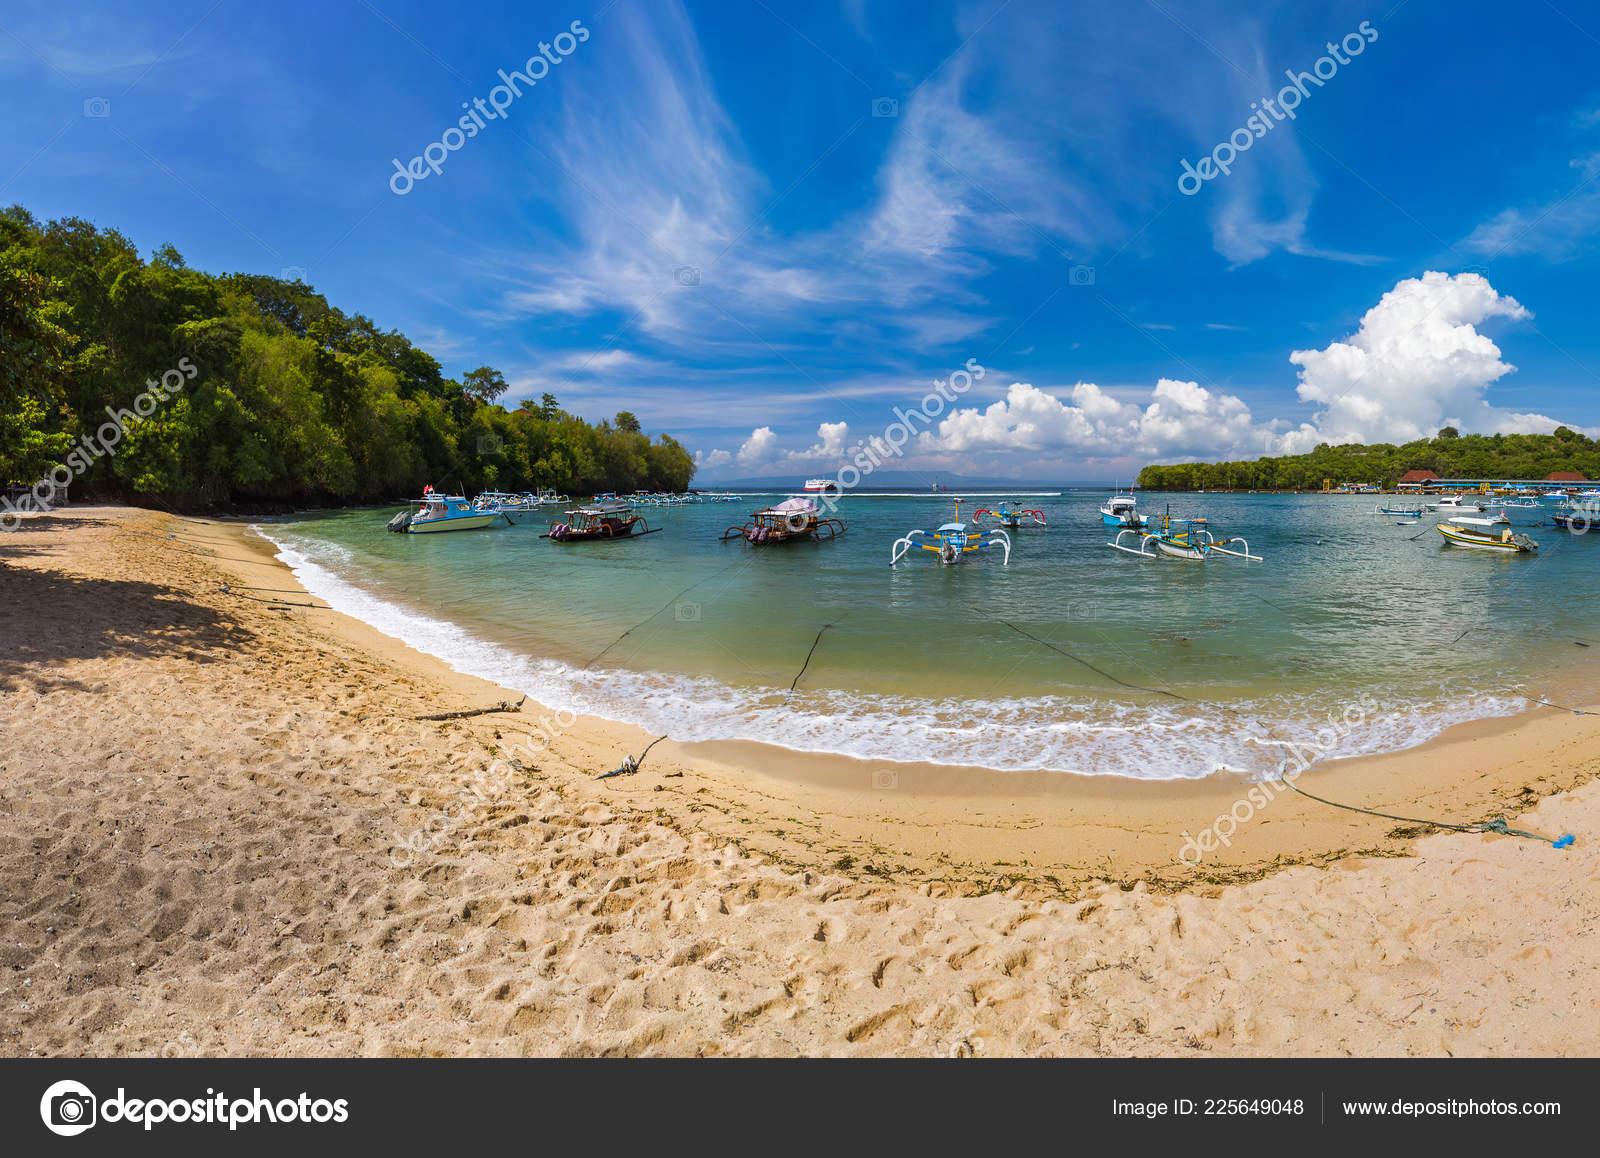 Padangbai Beach Bali Island Indonesia Nature Travel Background